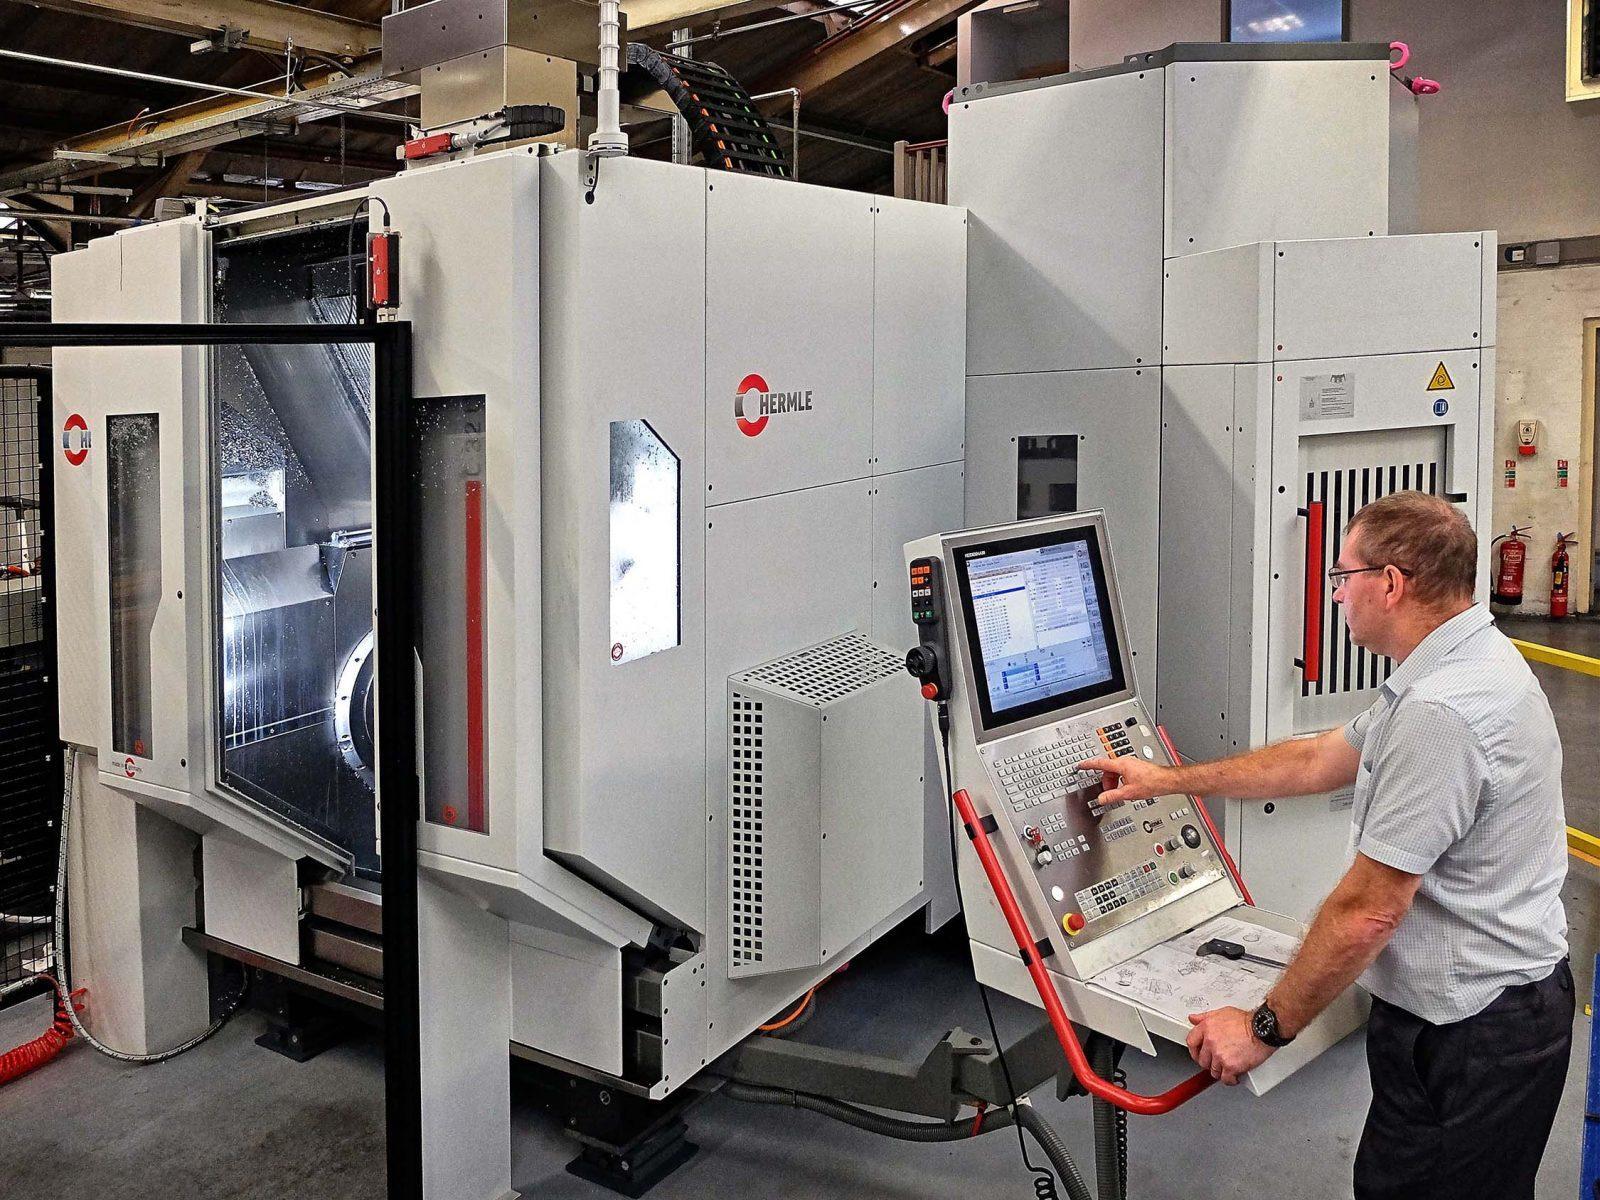 technician operating Hermle machine